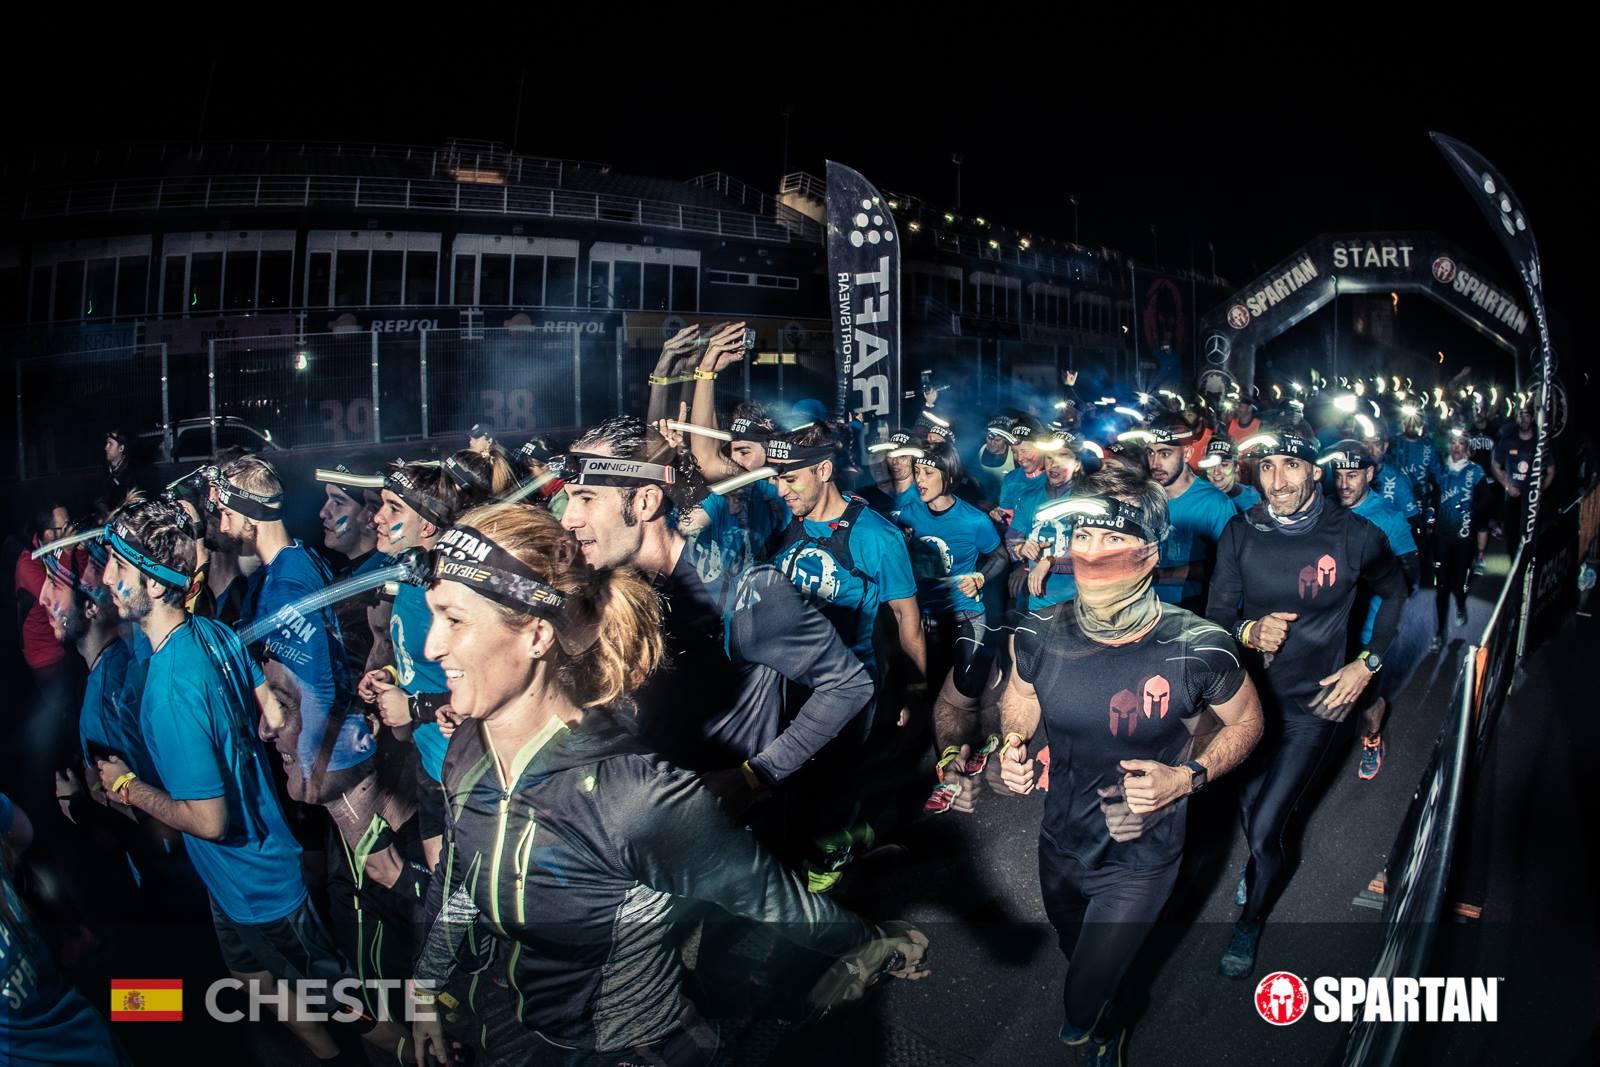 Racers leaving start line in night sprint